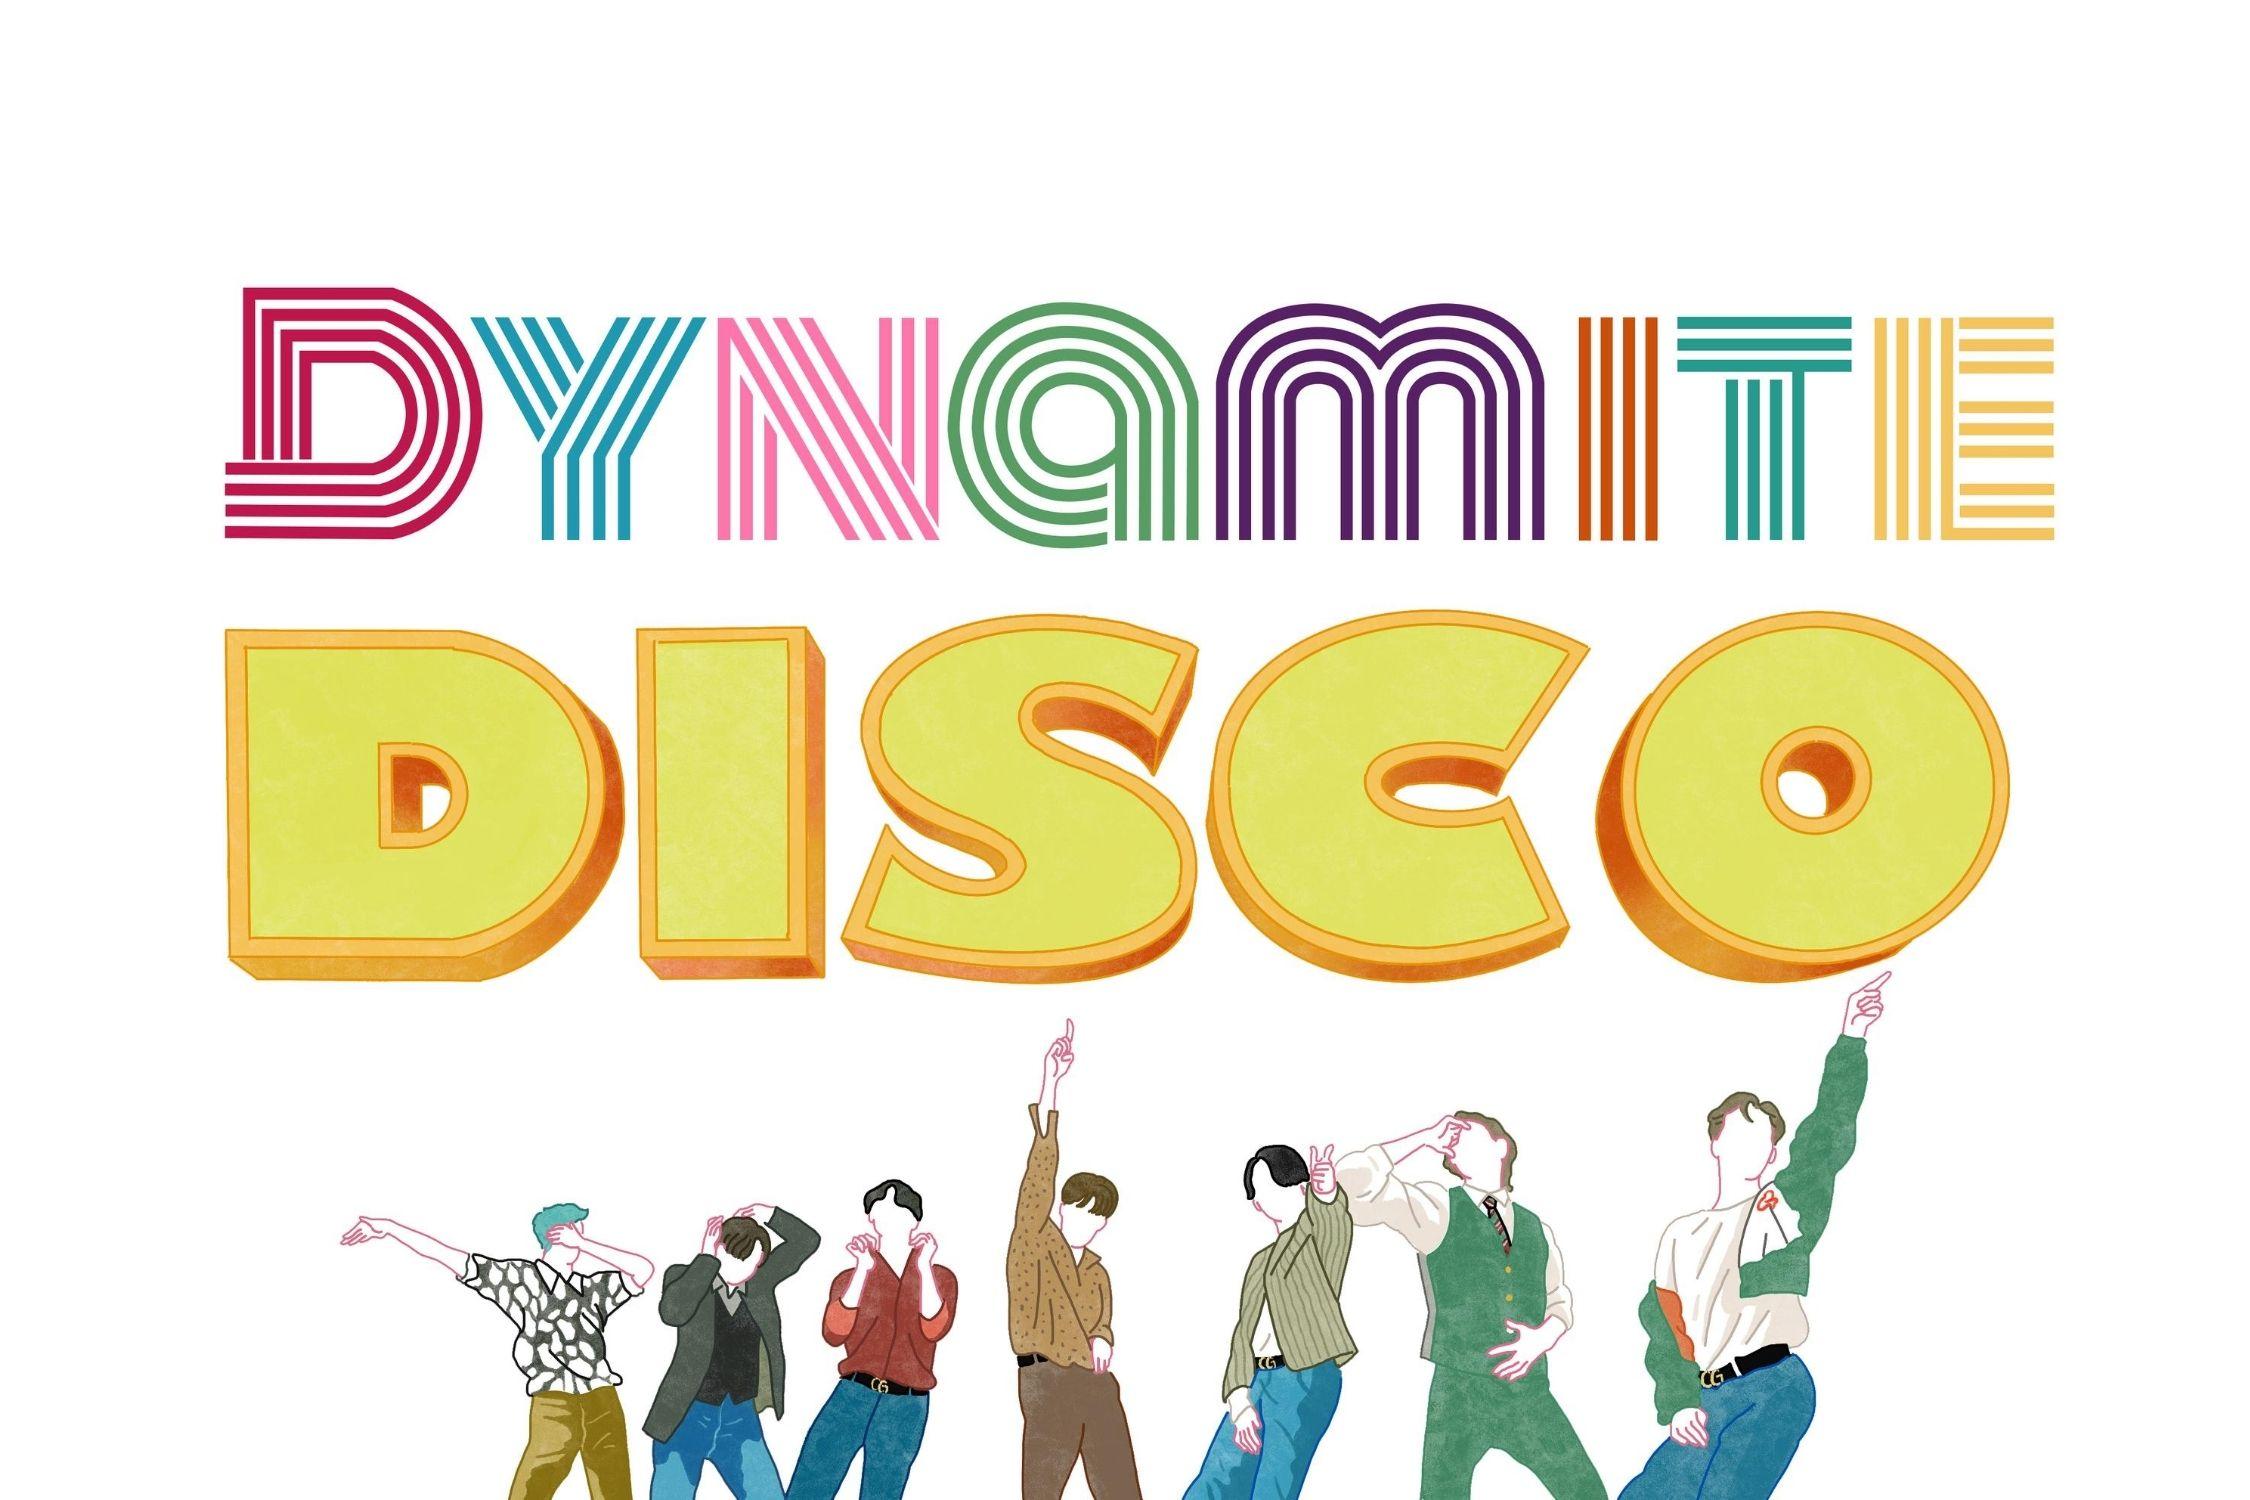 BTS Dynamite Clipart,LOGOPNG, bangtan boys disco